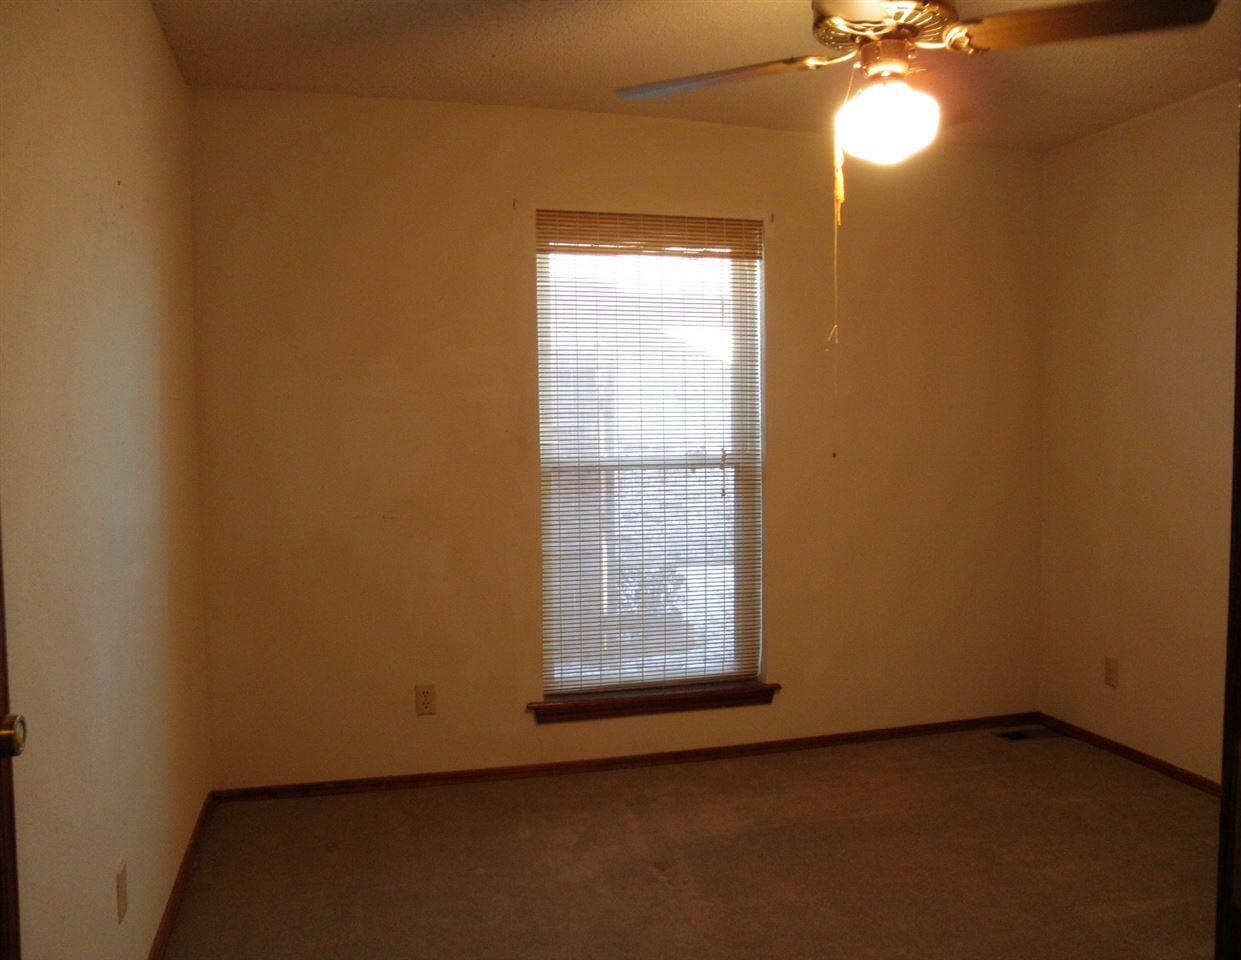 Sold Cross Sale W/ MLS | 2516 Oriole  Ponca City, OK 74601 17